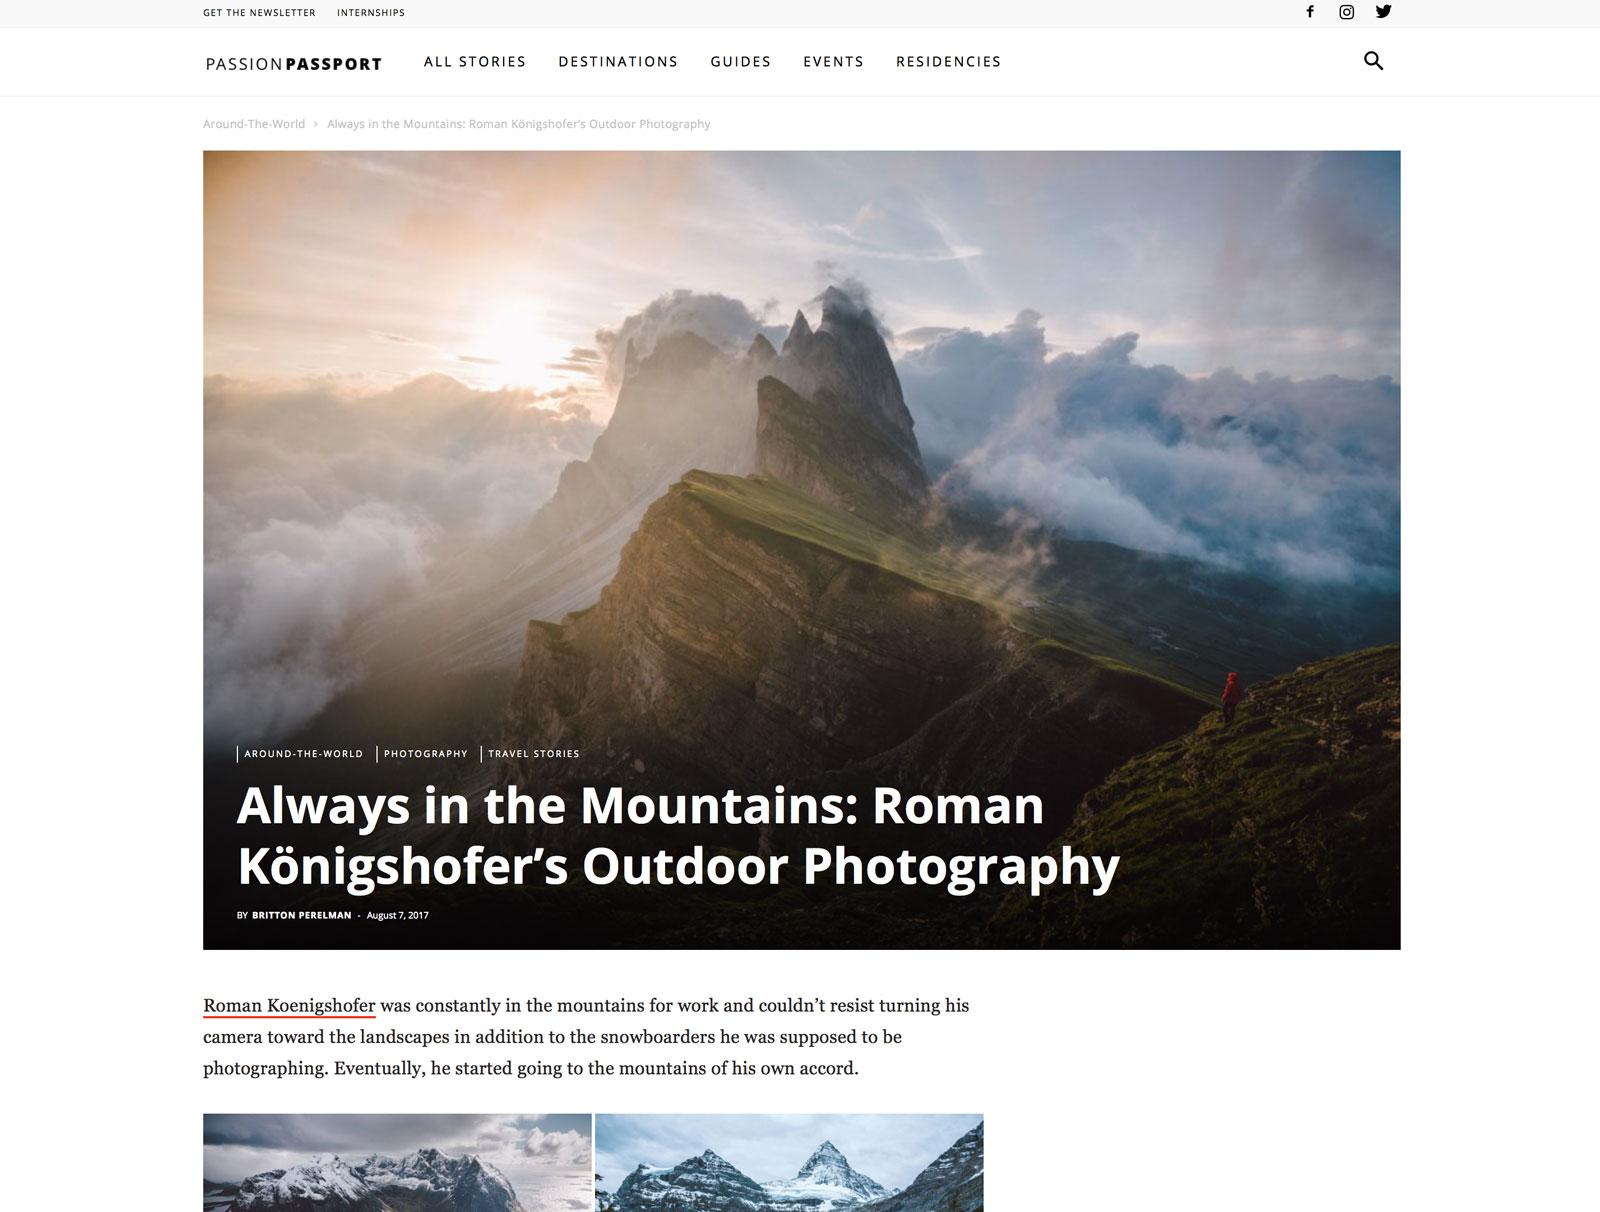 RomanKoenigshofer_Interview_Feature_Passionpassport